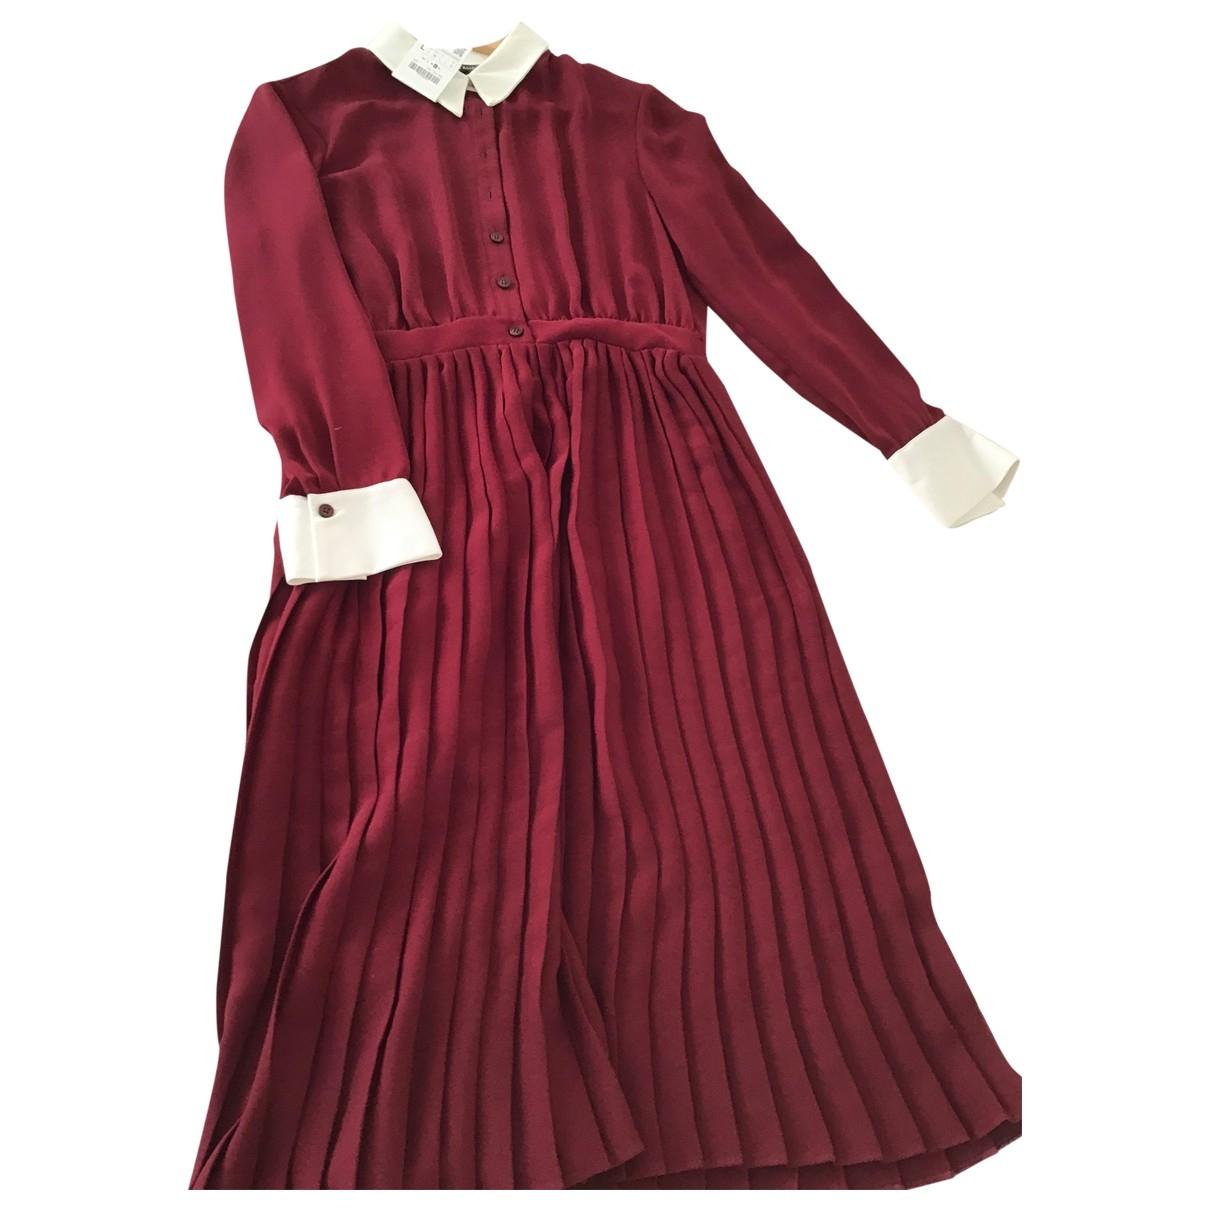 Zara - Robe   pour femme - bordeaux